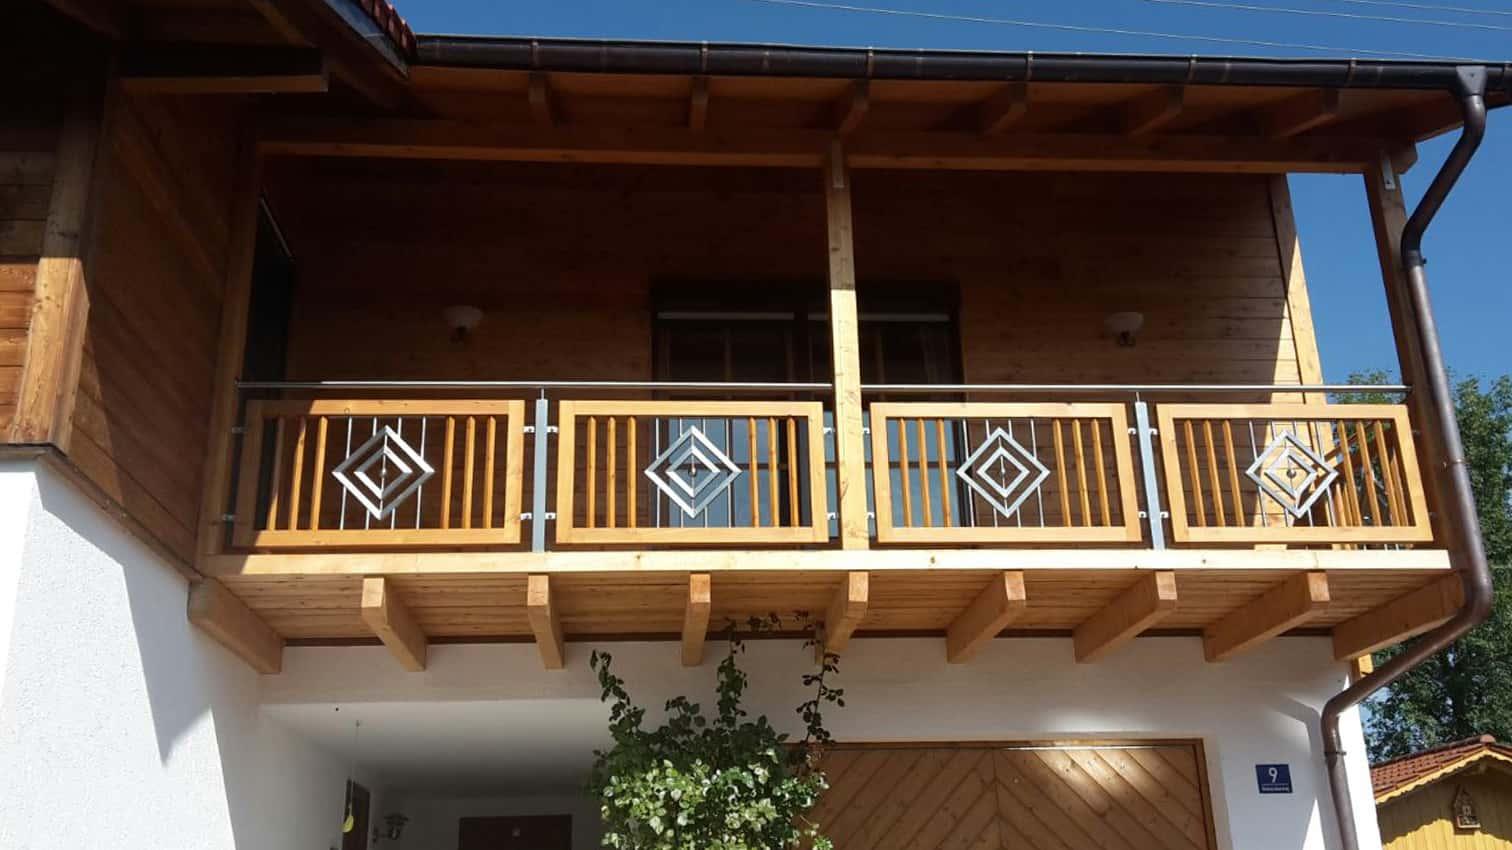 Balkon mit Edelstahleinsatz